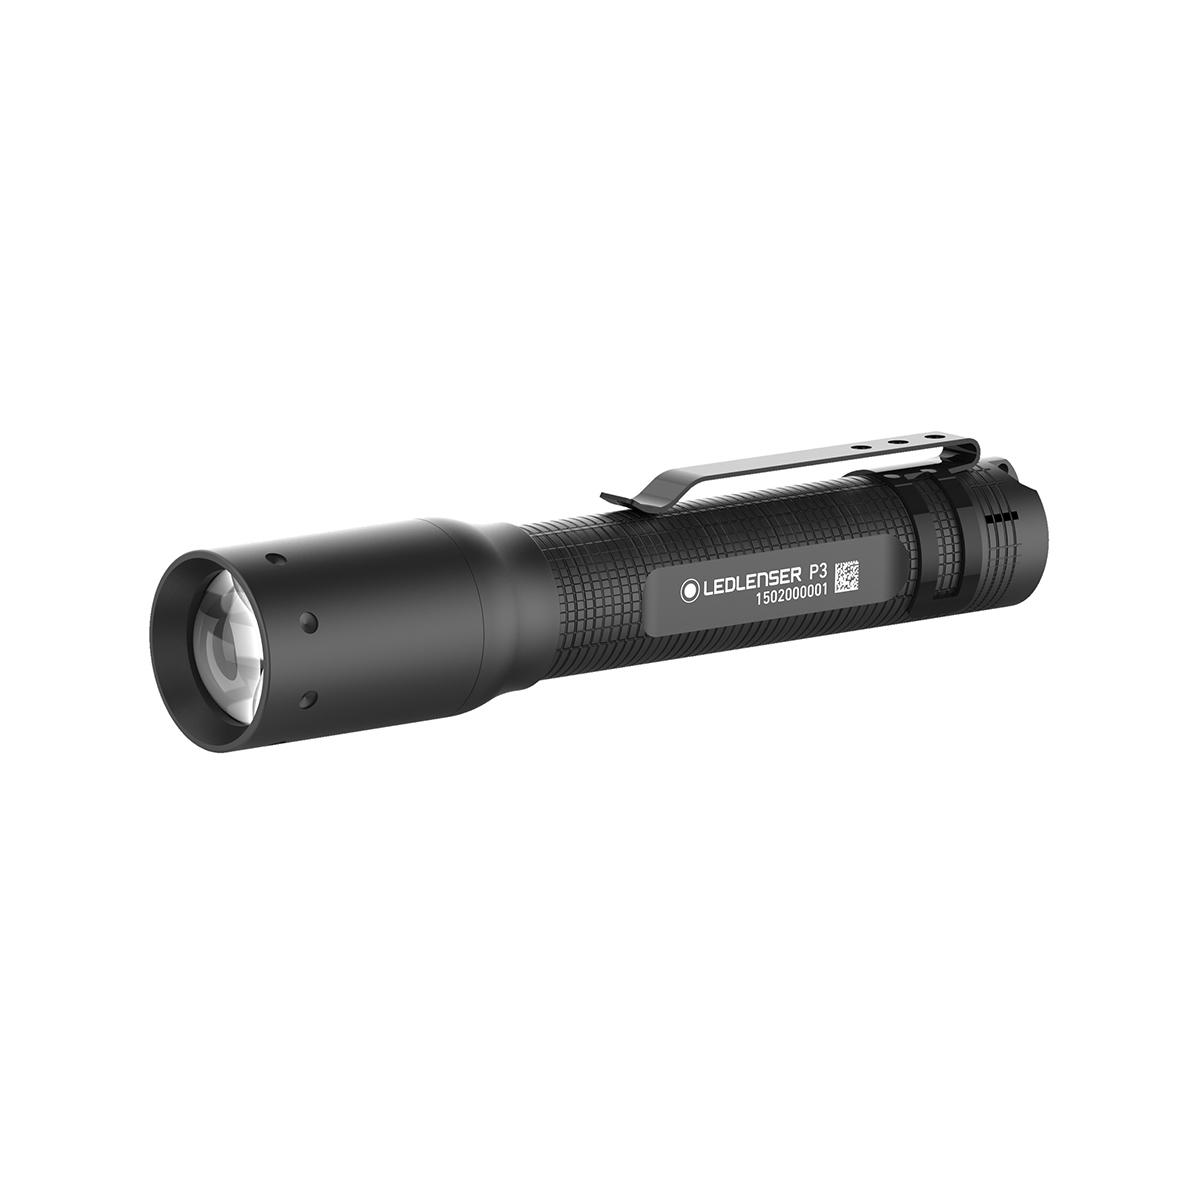 Led Lenser P3 Torch - Gift Box - Tentworld 65f03429ce